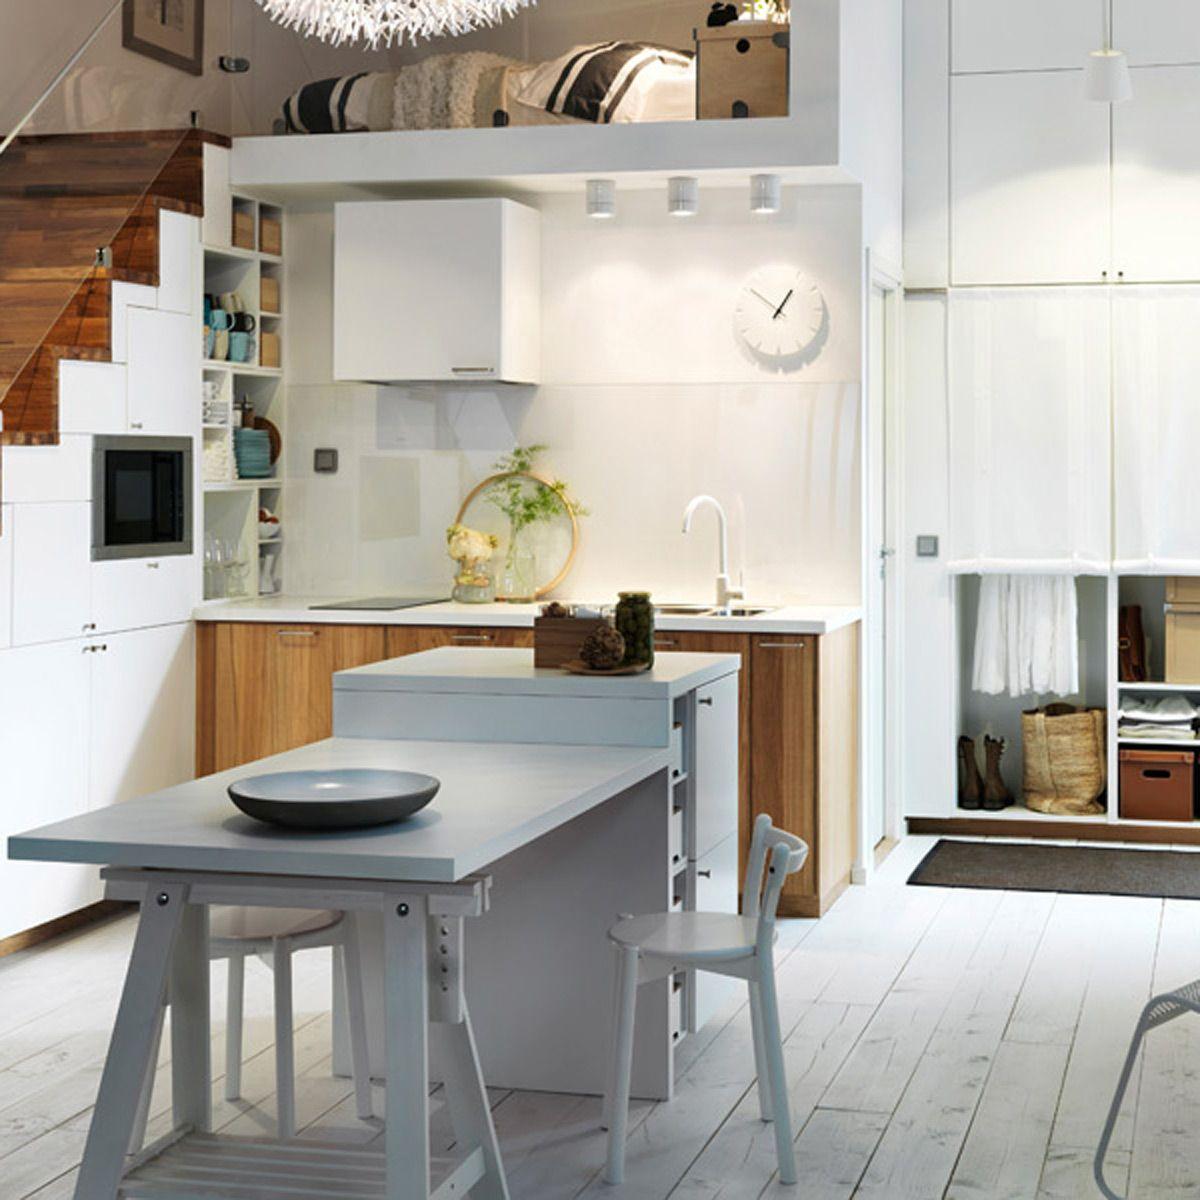 Modern Storage Ideas For Small Spaces Staircase Design: 5 Original Space-saving Kitchen Storage Ideas